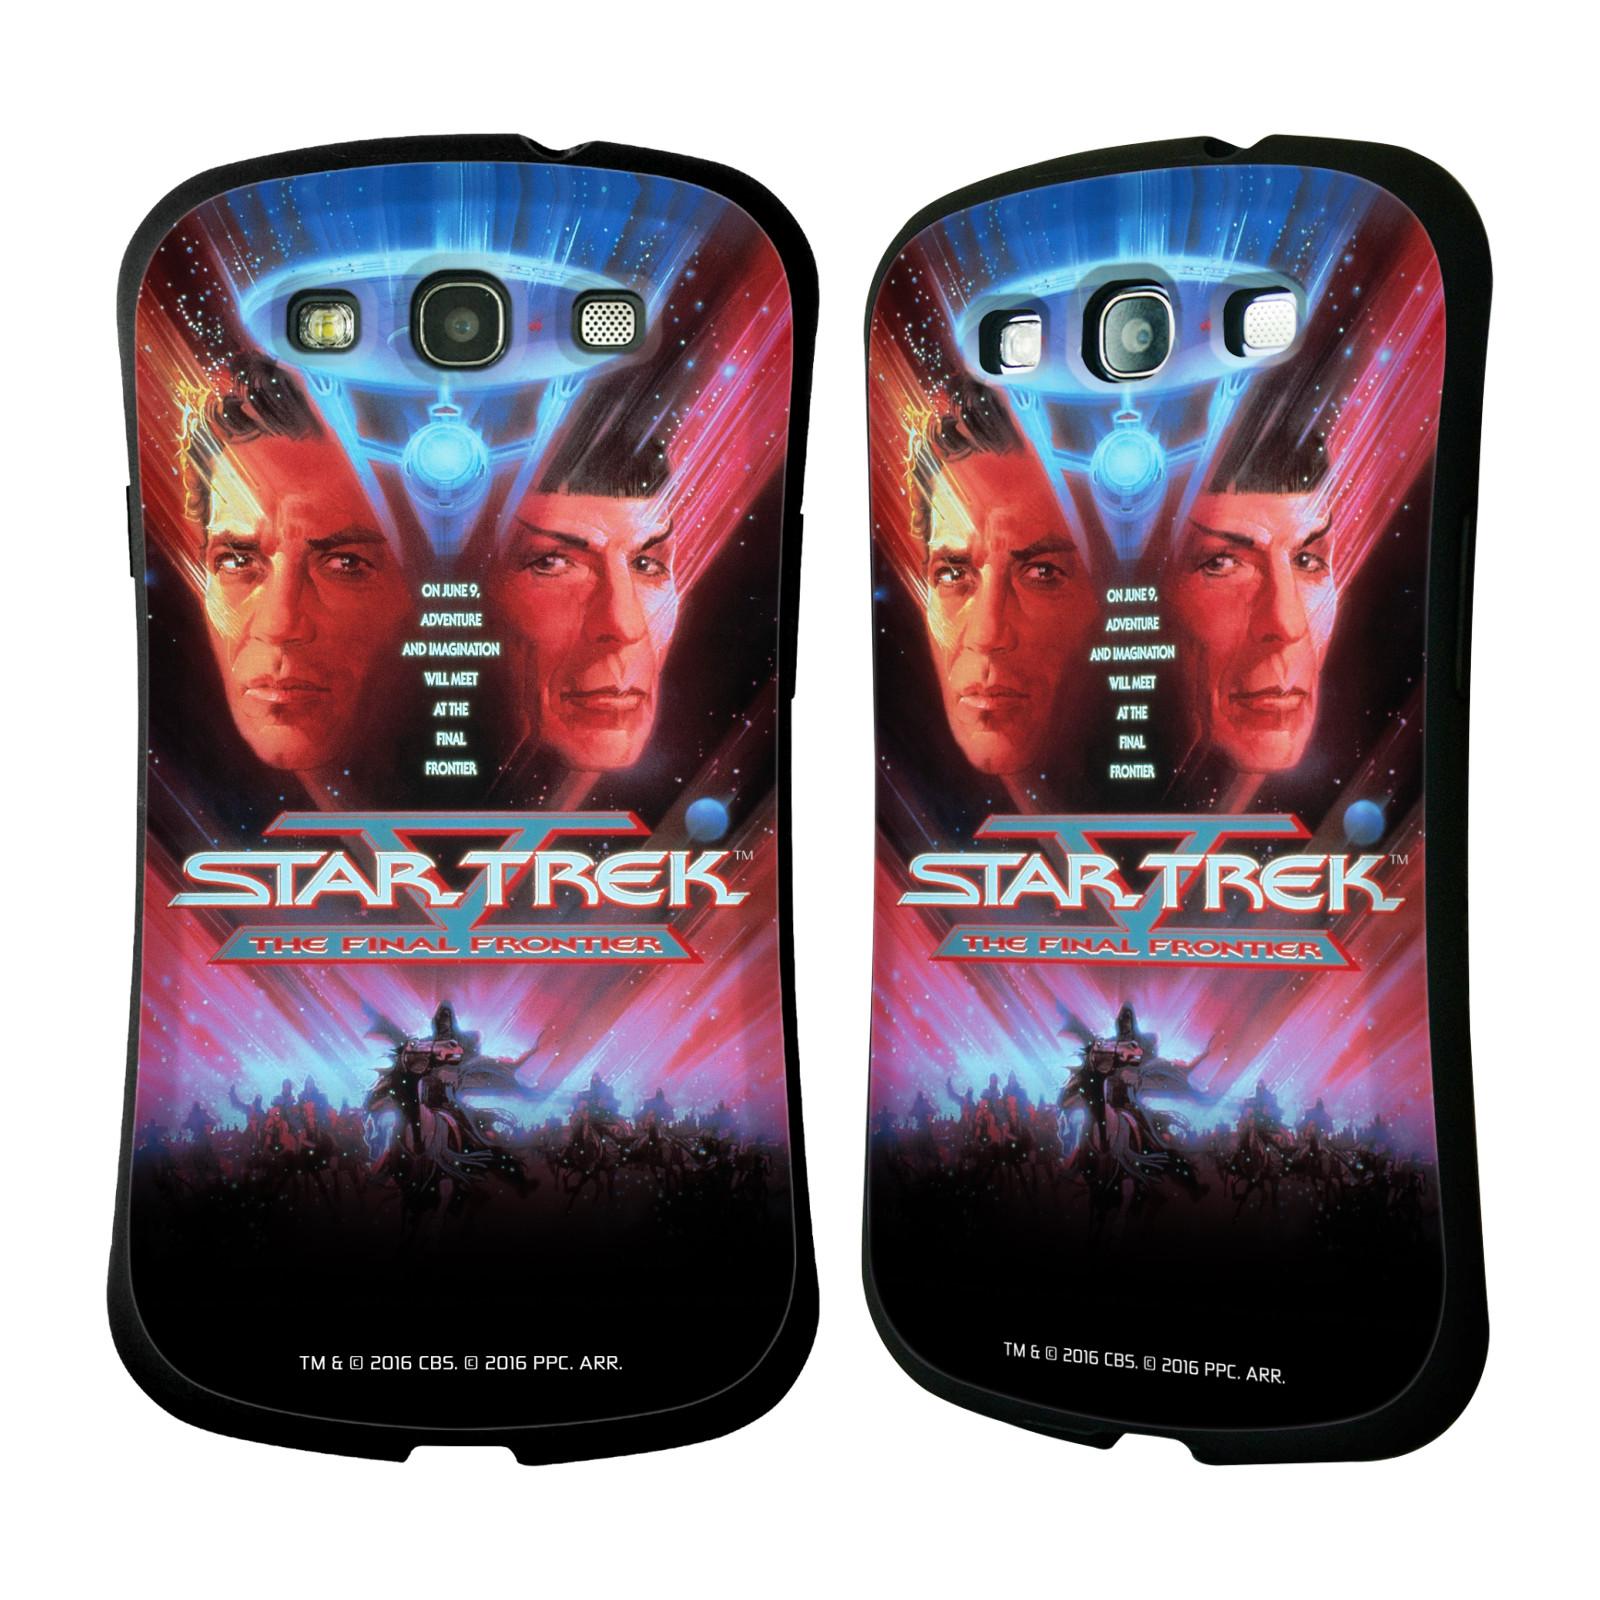 HEAD CASE silikon/plast odolný obal na mobil Samsung Galaxy S3 i9300 / S3 NEO Star Trek Filmové plakáty Nejzazší hranice